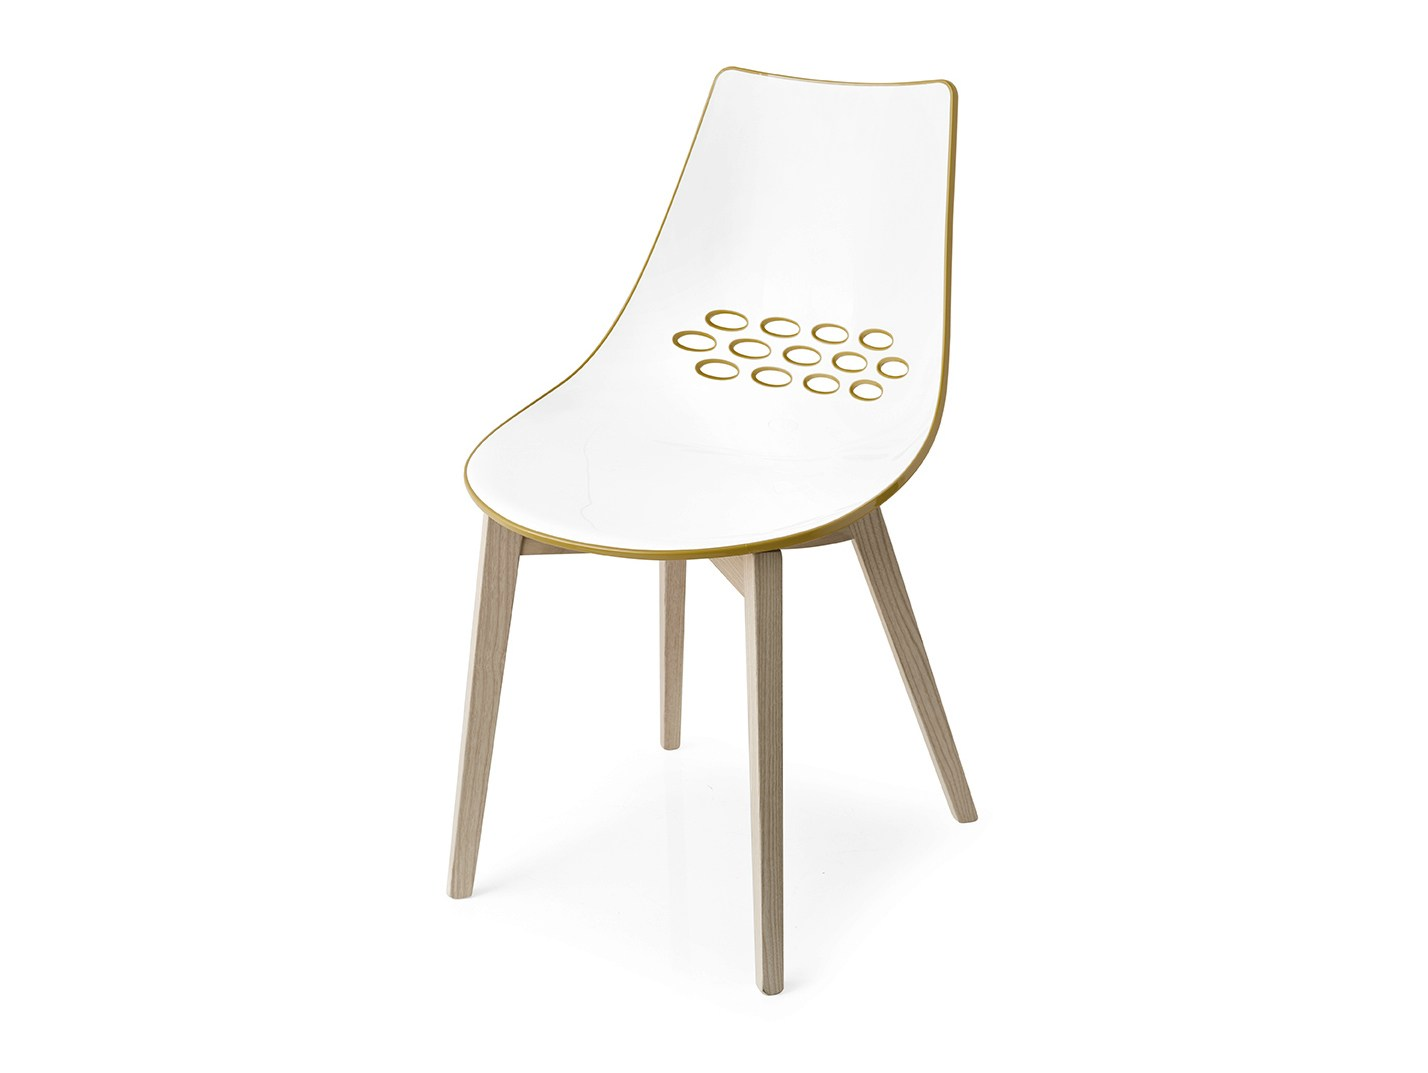 Jam w sedia by calligaris design archirivolto for Prodotti calligaris